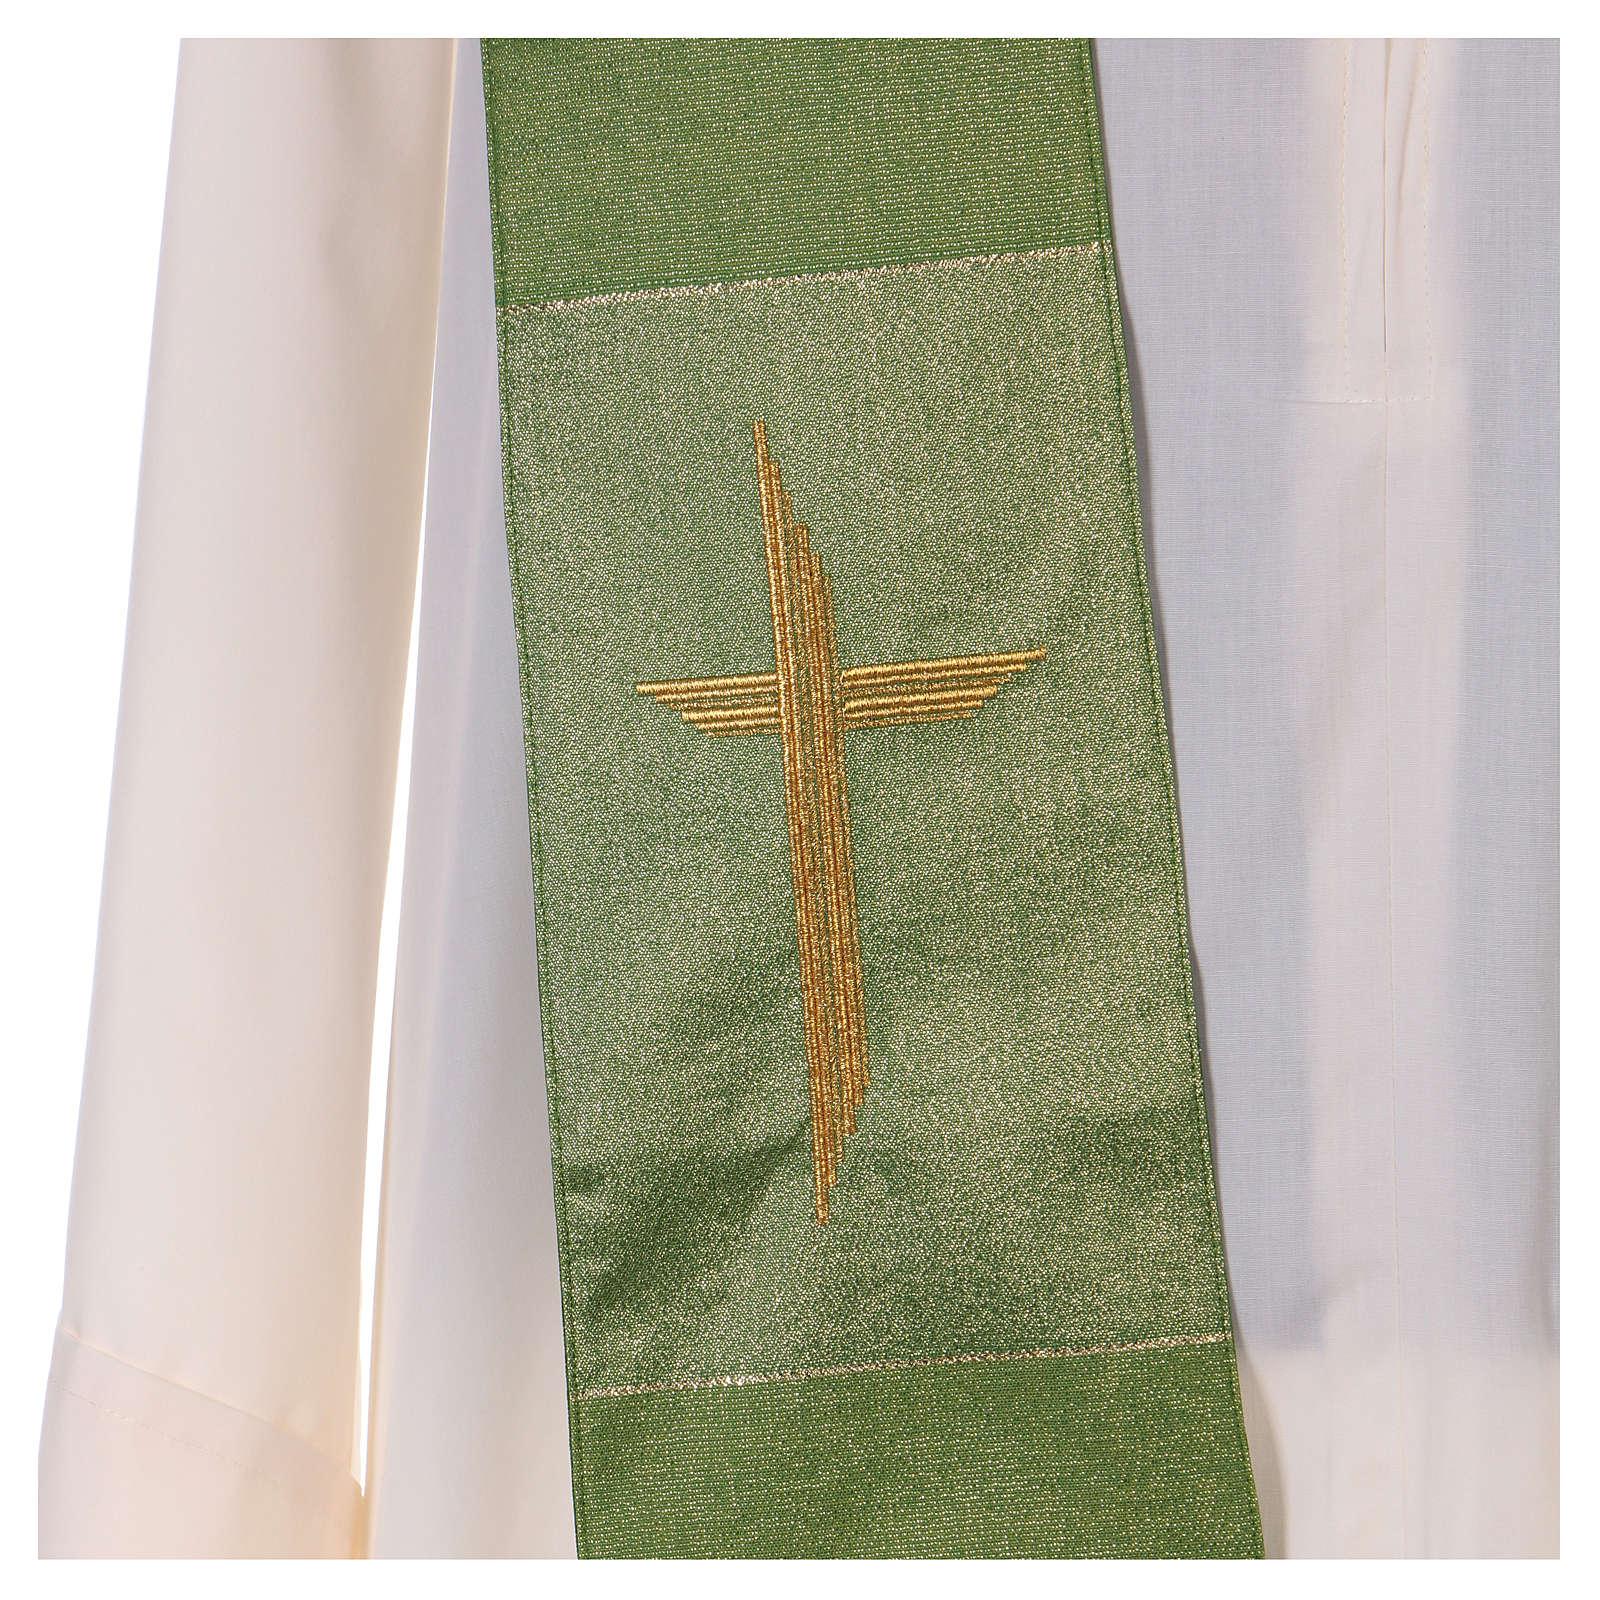 Estola 85% lana 15% lurex con cruz dorada 4